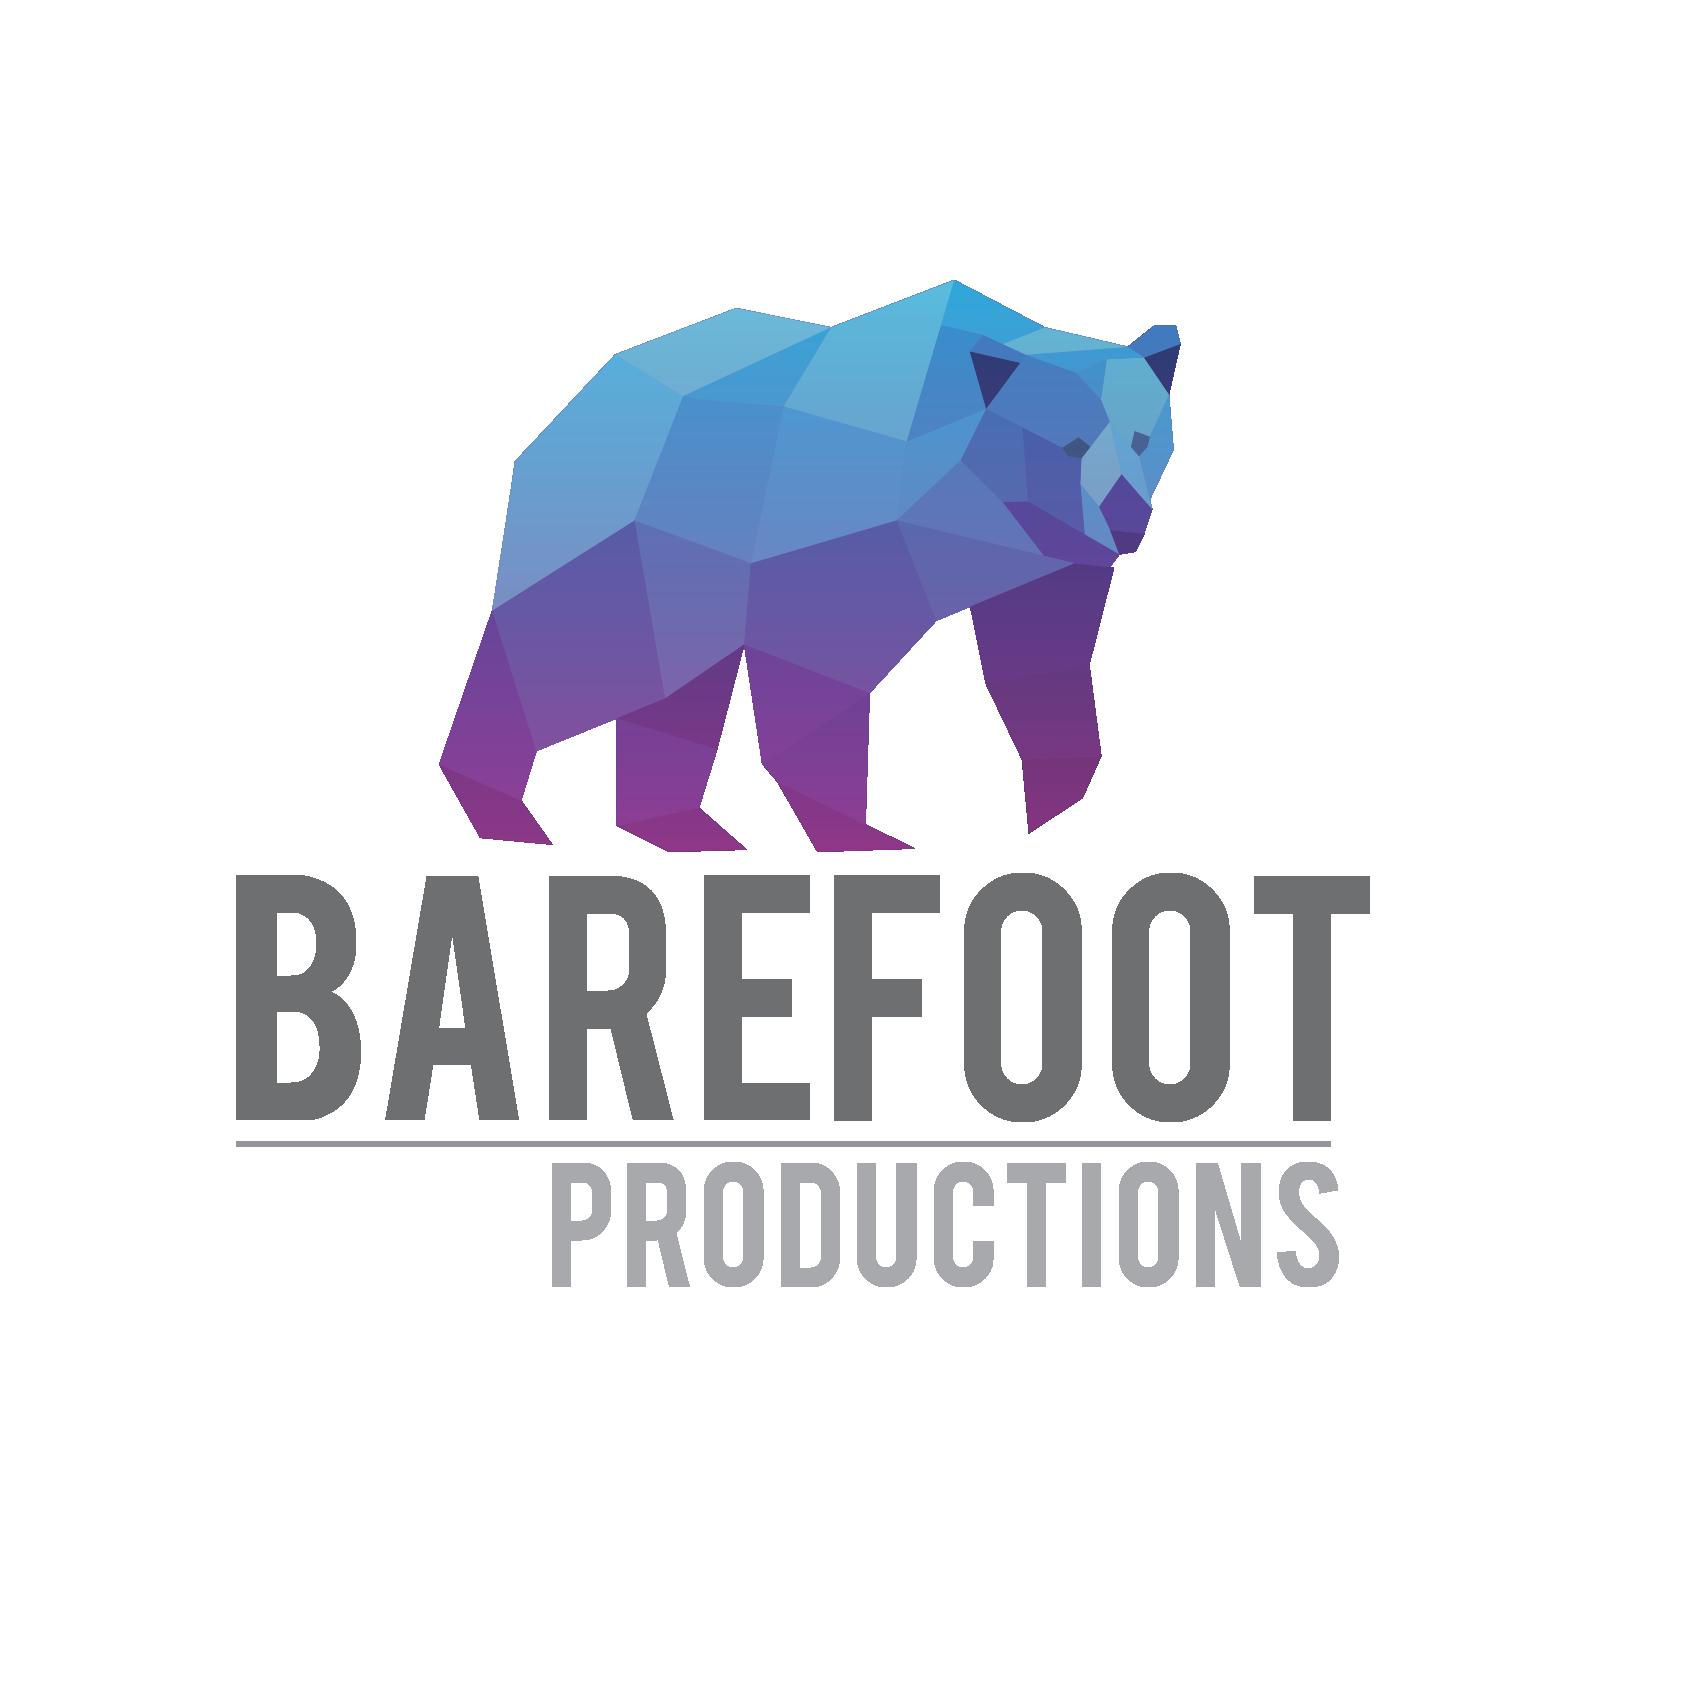 Barefoot_logo copy.png